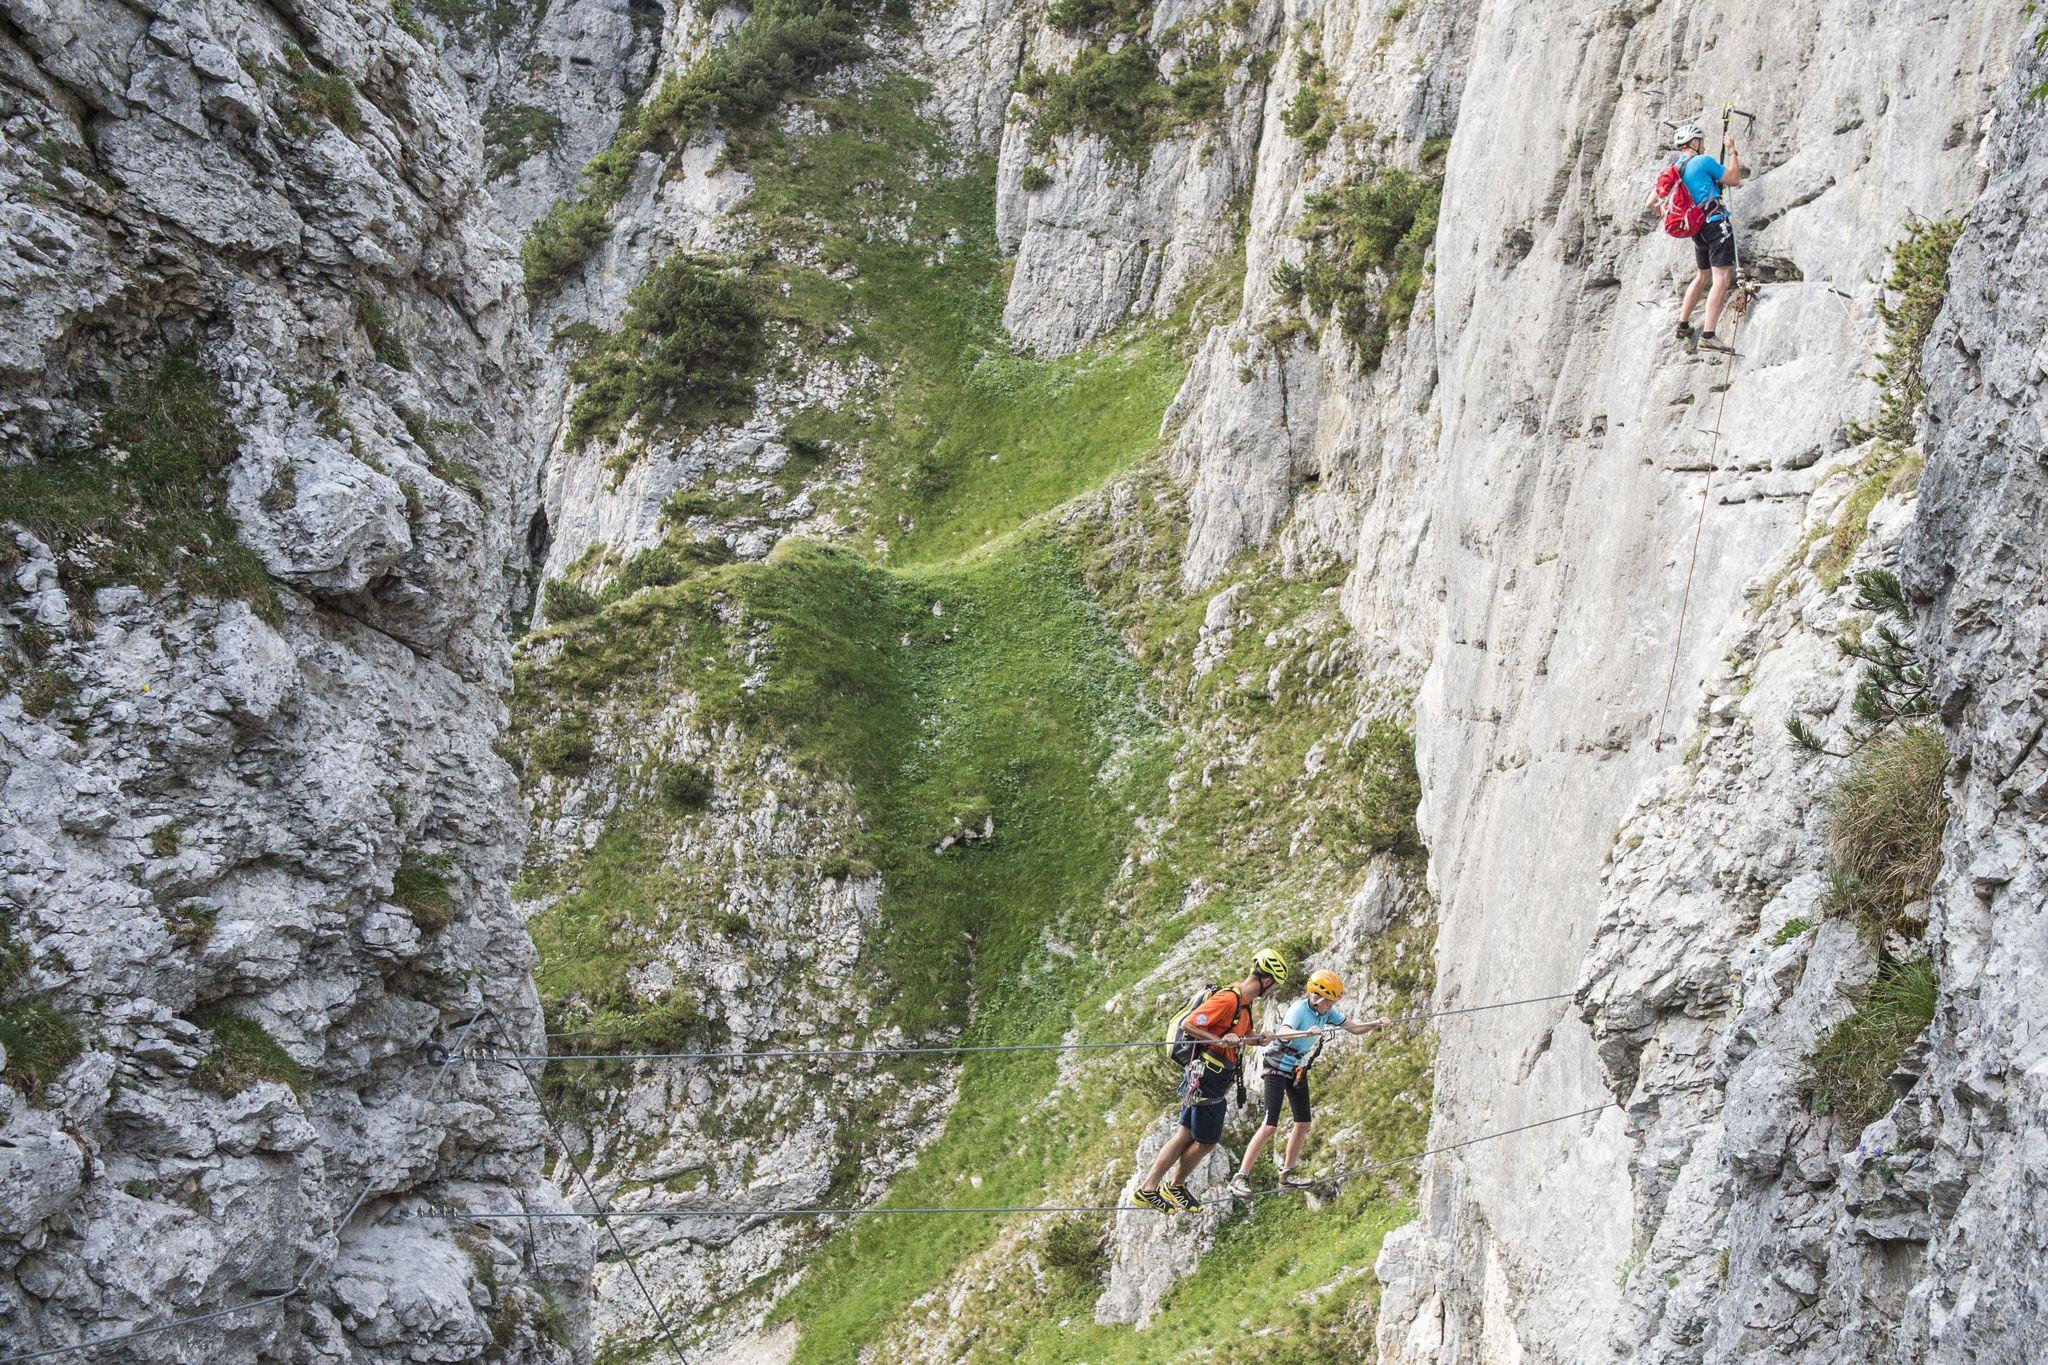 Klettersteig Klamml : Klettersteig klamml Österreichs wanderdörfer